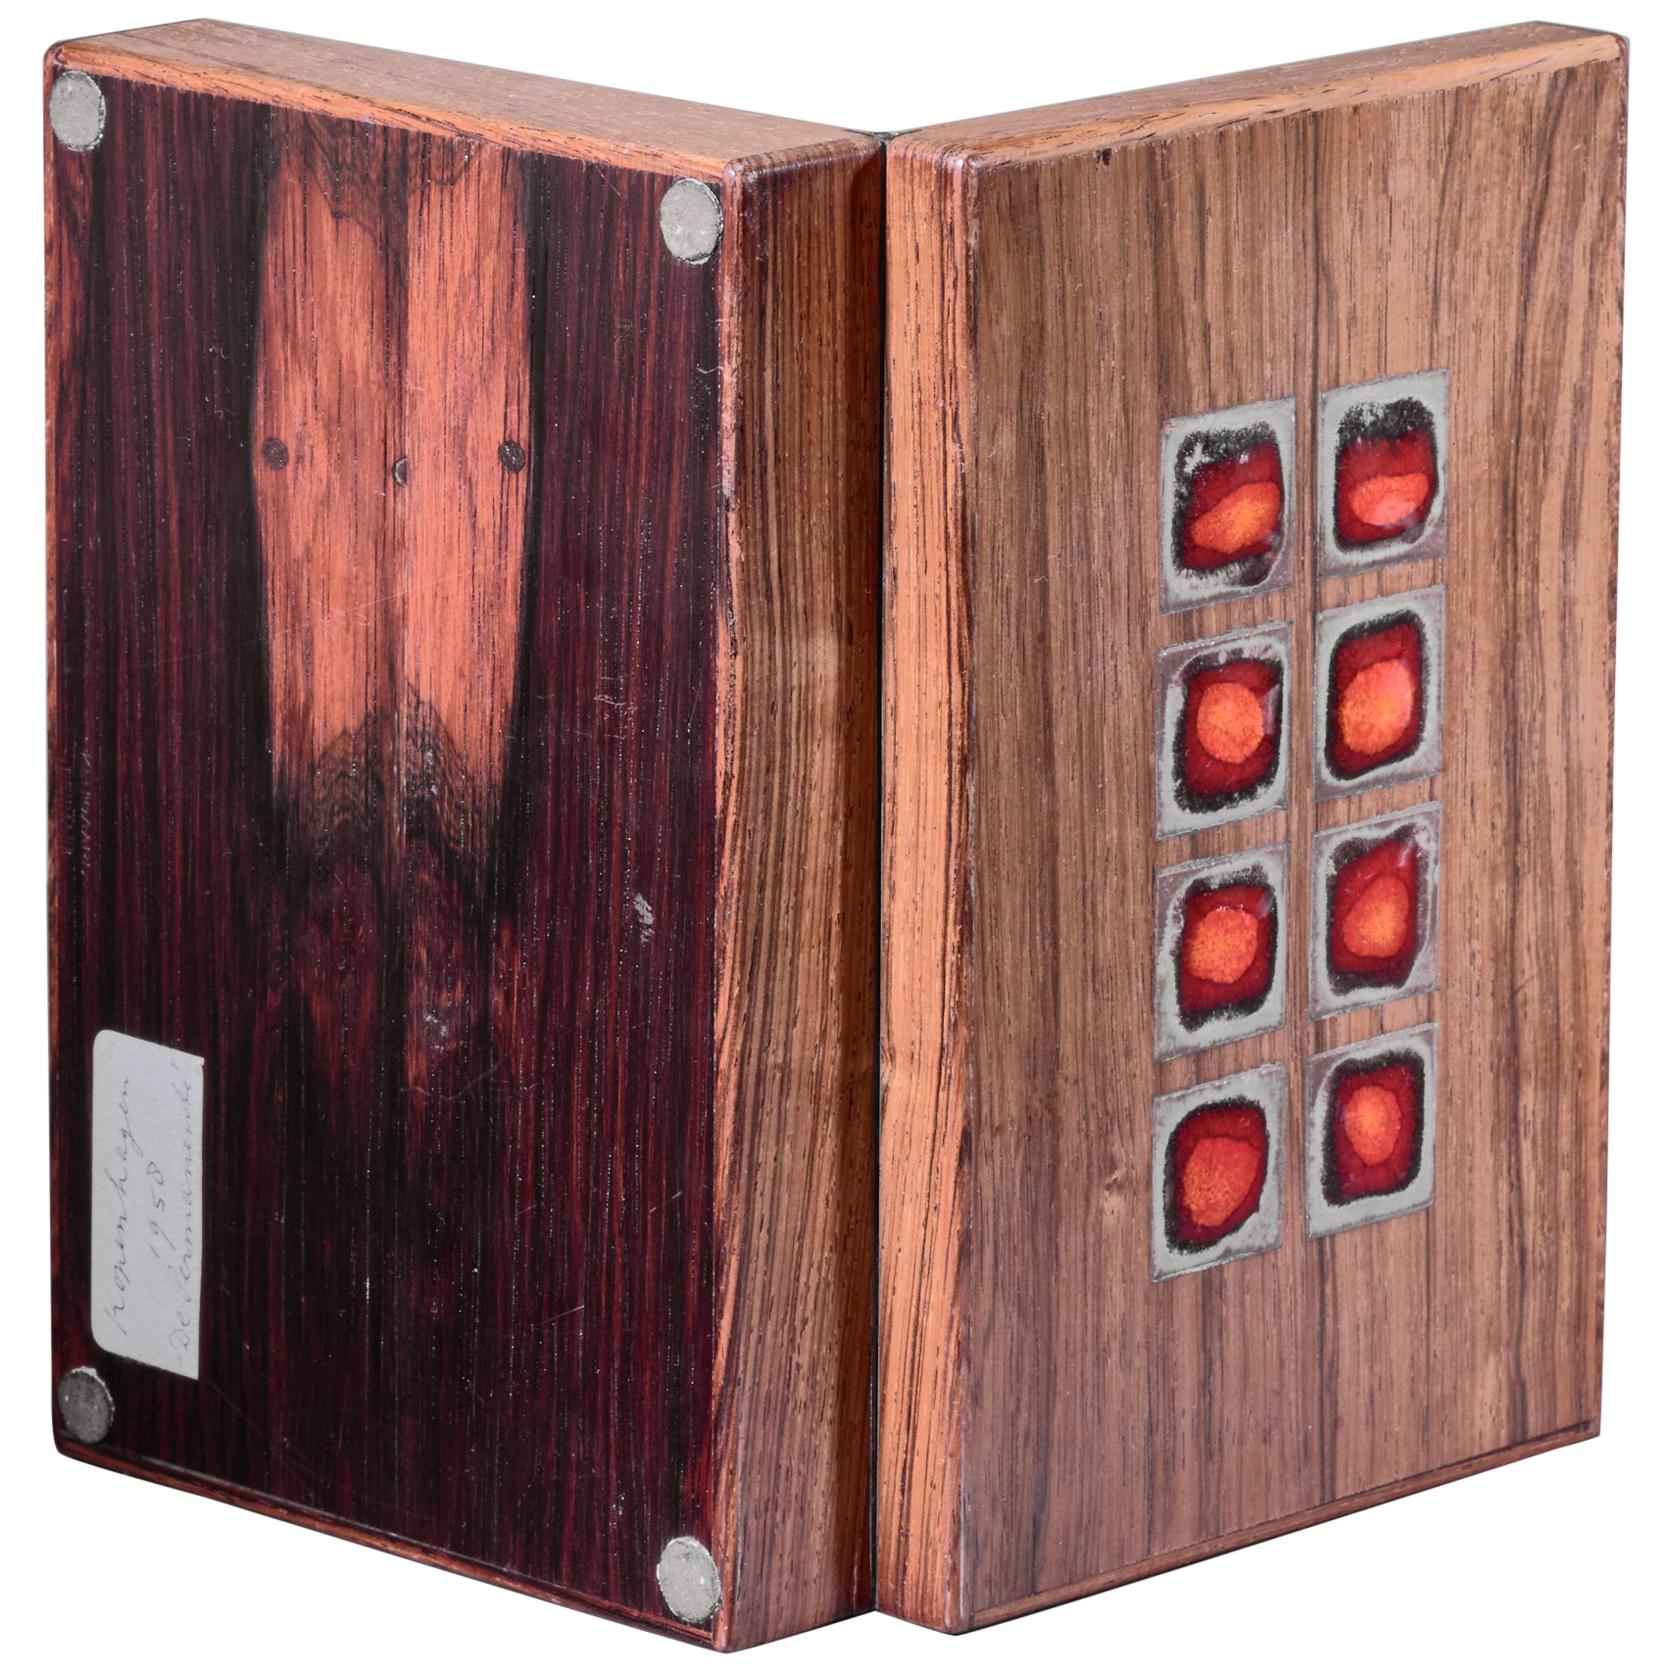 Wooden and Enamel Alfred Klitgaard Desk Top Storage Box